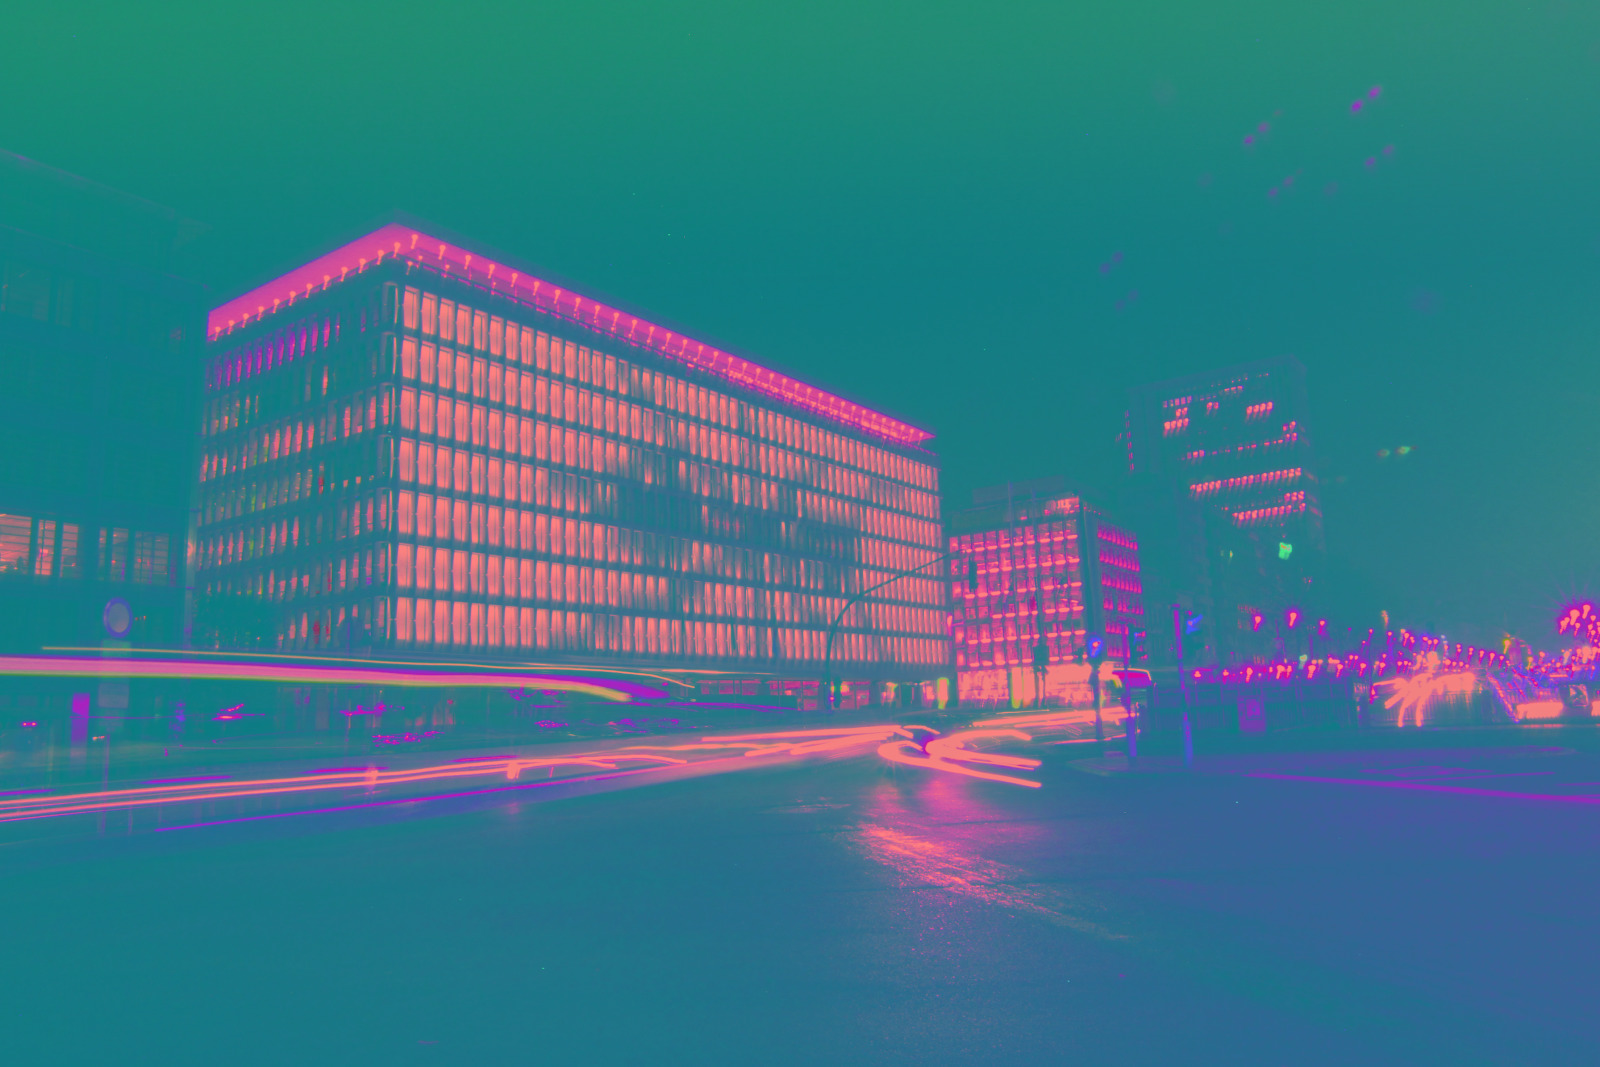 Peter Kogler Enter His Mesmerizing World In Brussels